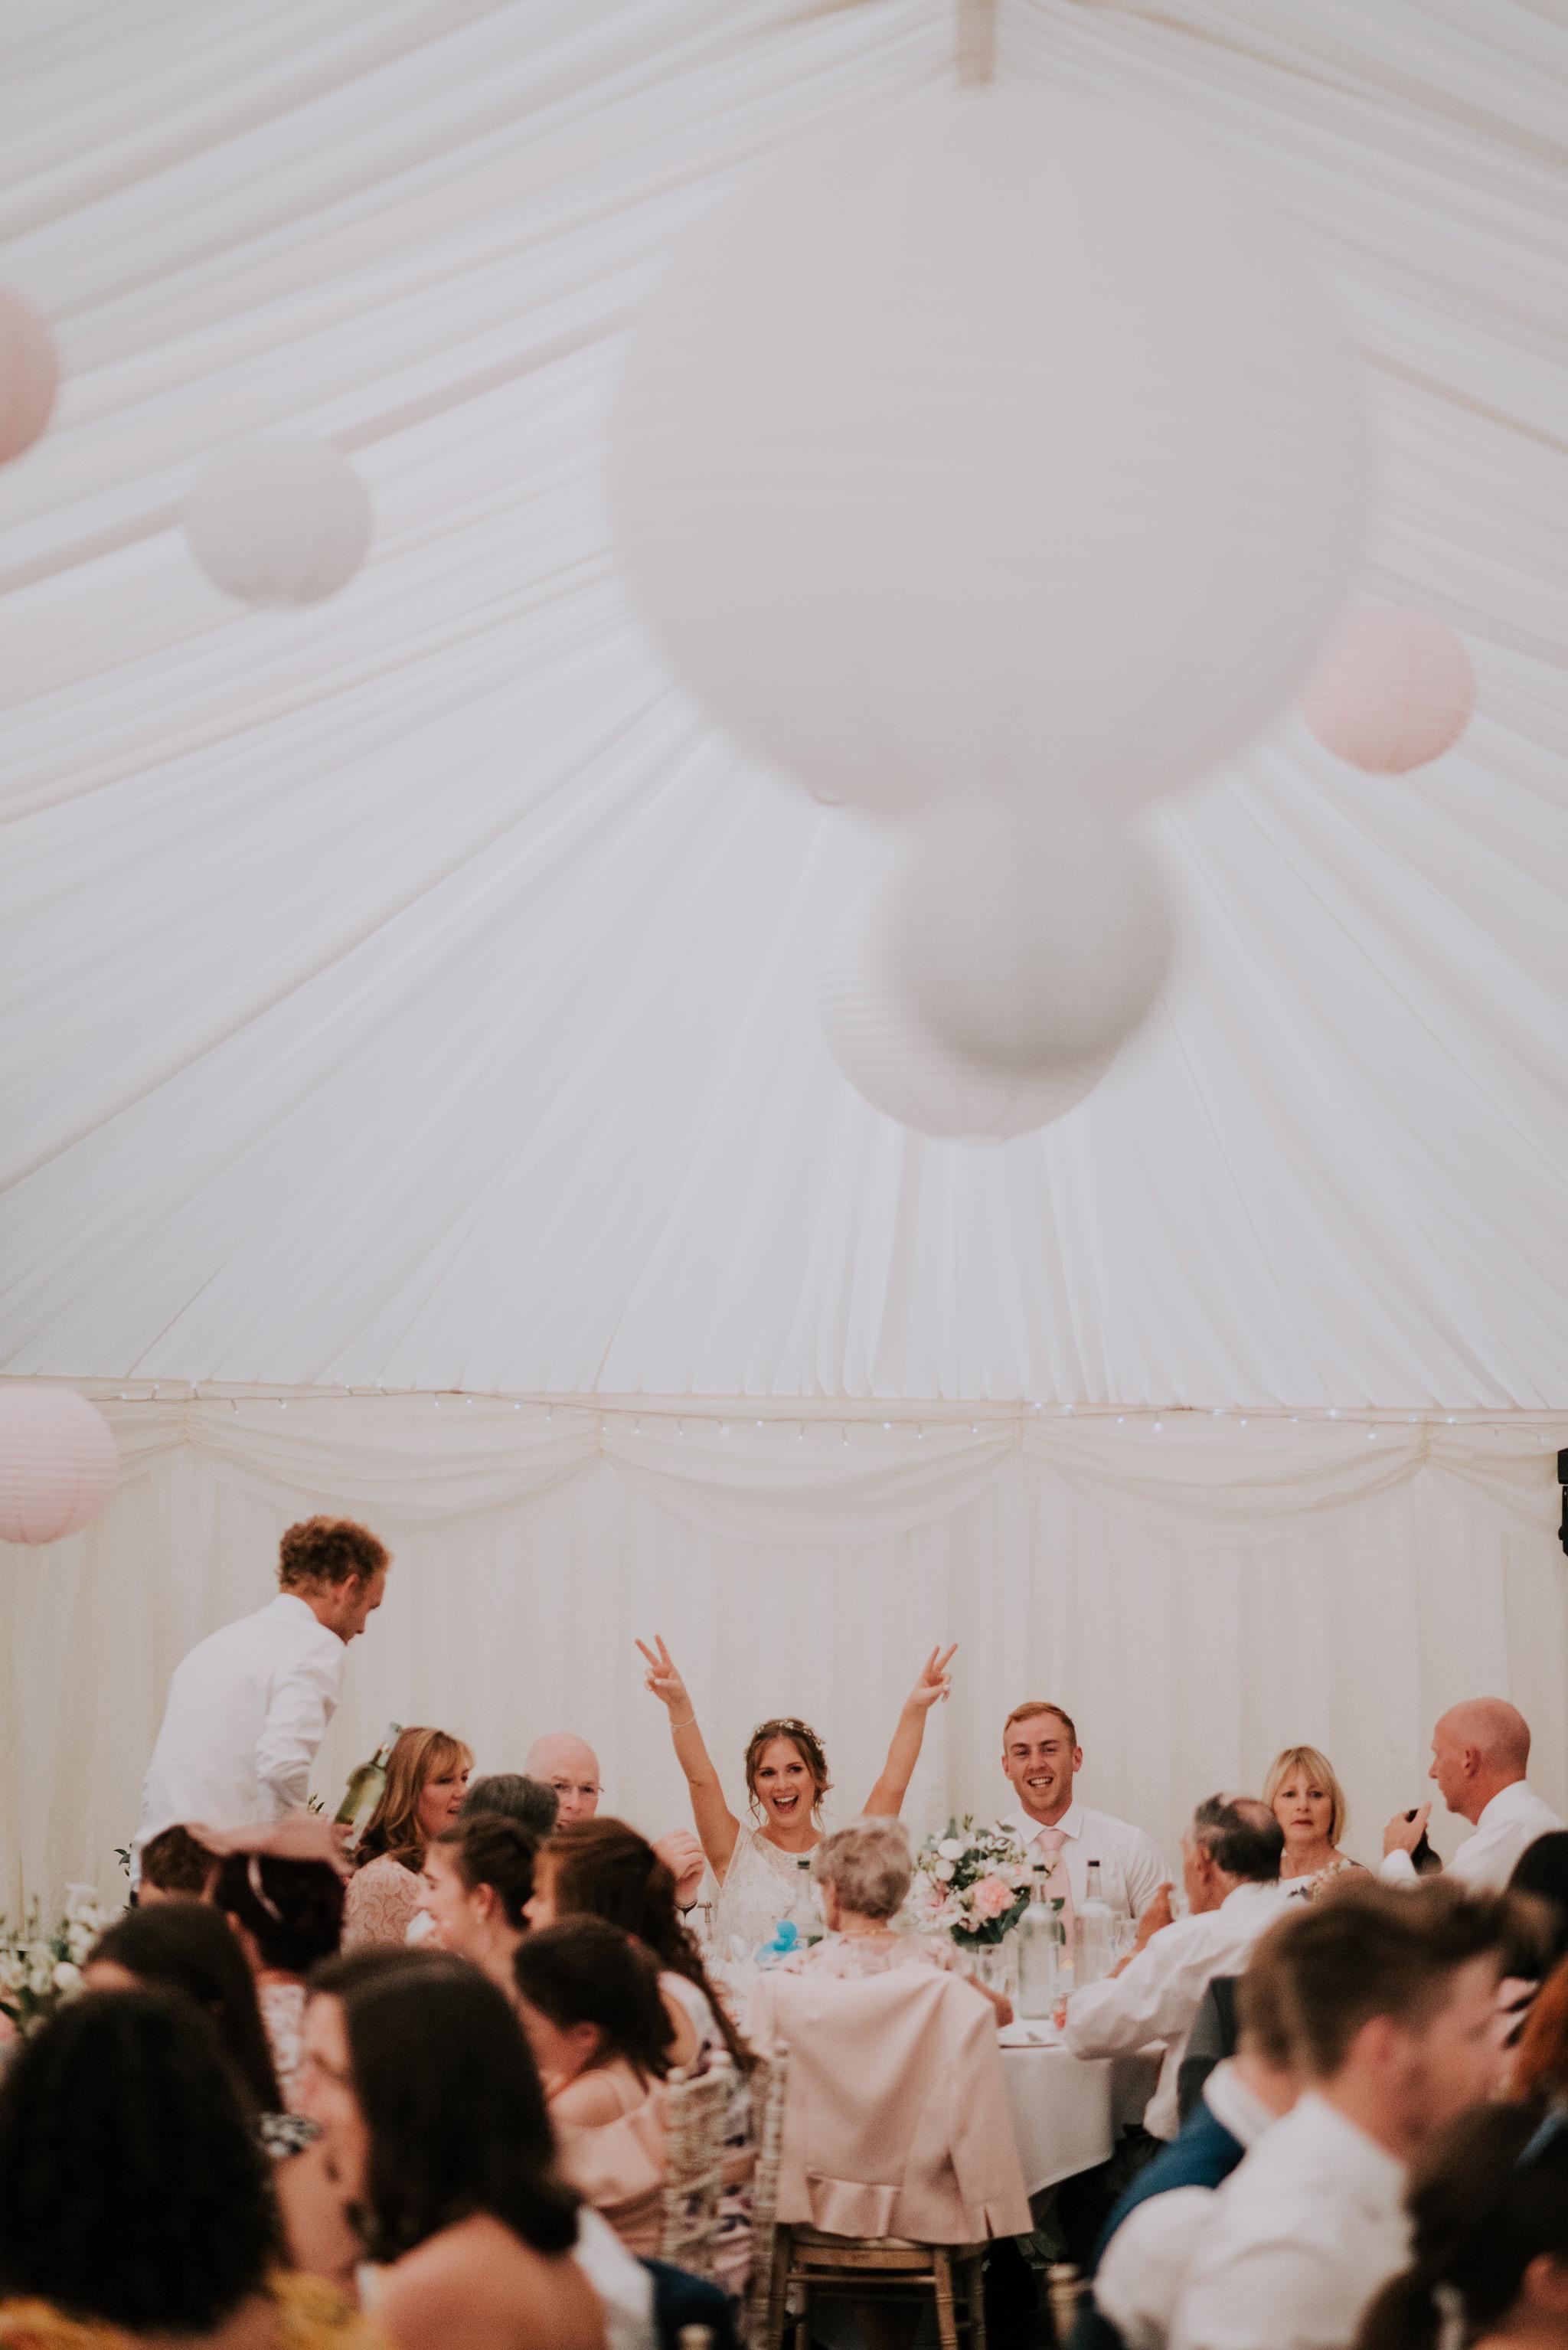 scott-stockwell-photography-wedding-36.jpg